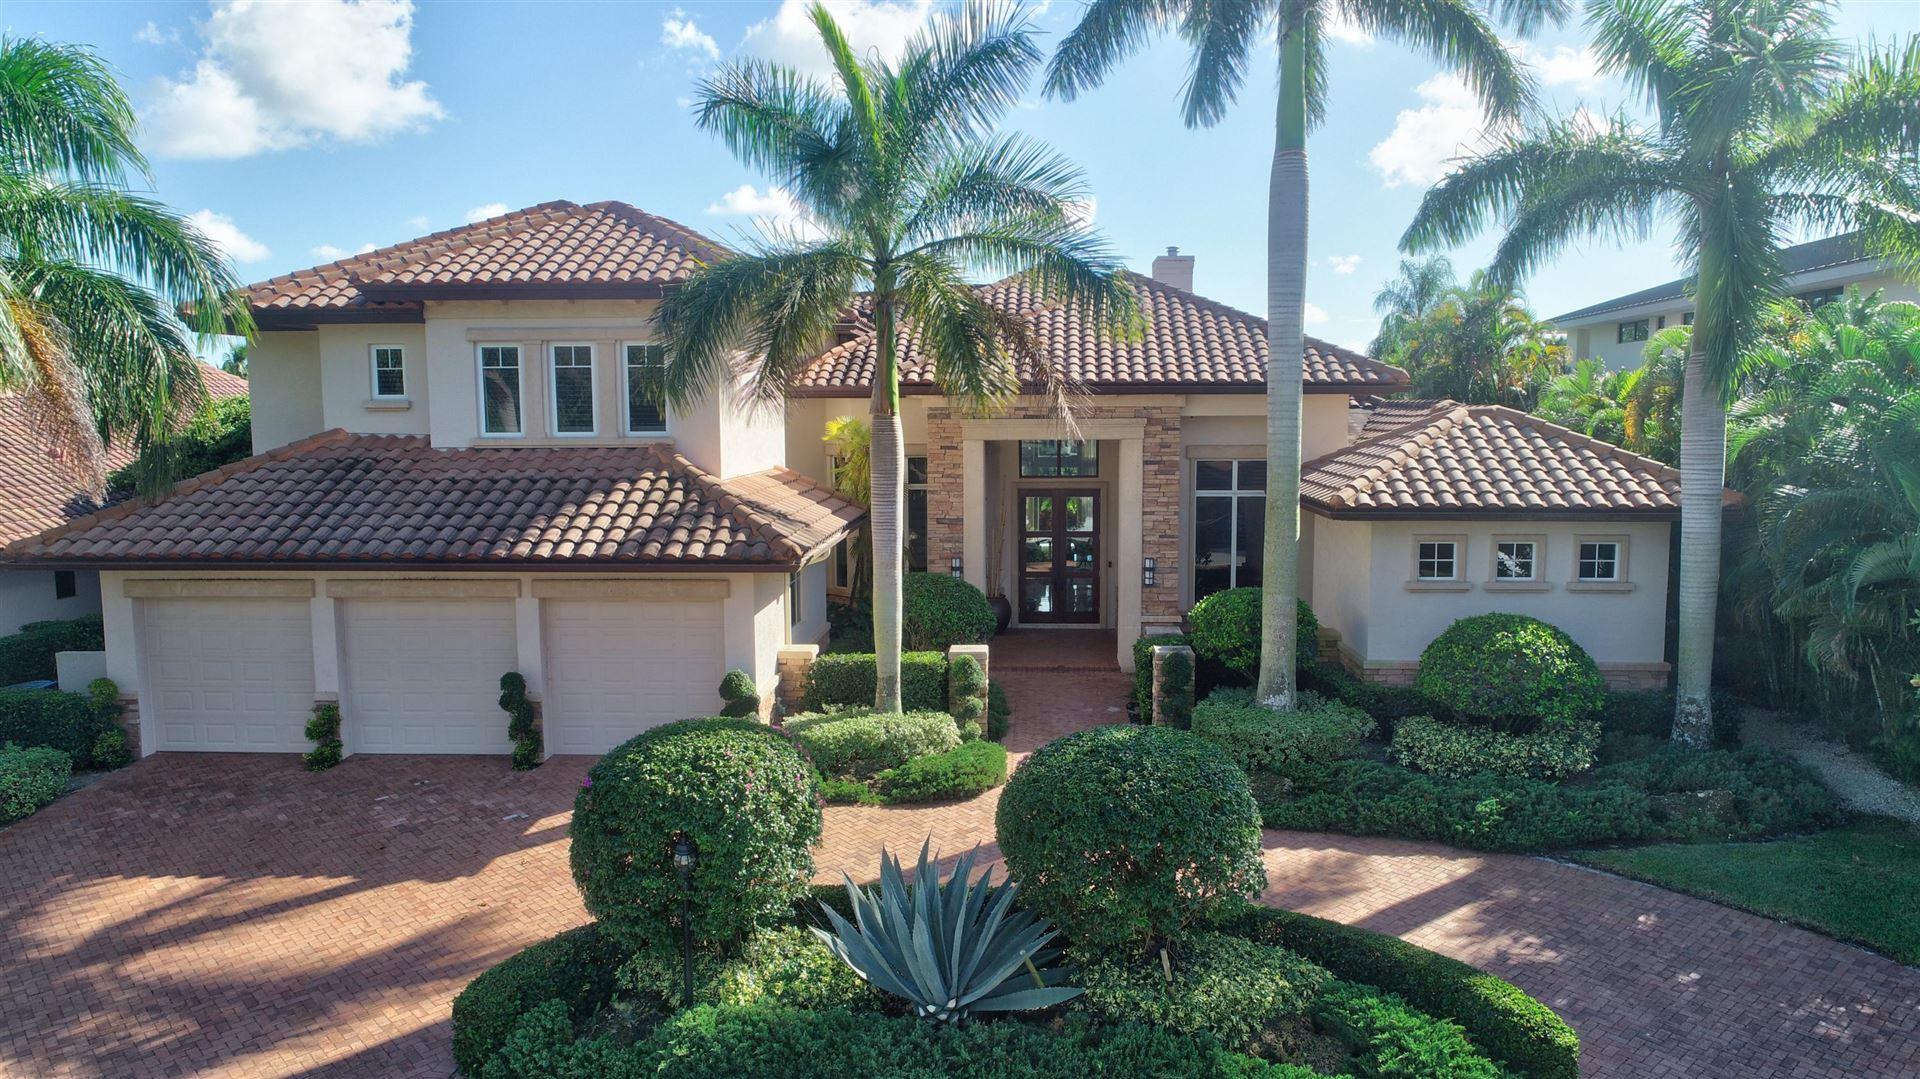 7059 Queenferry Circle, Boca Raton, FL 33496 - #: RX-10624820